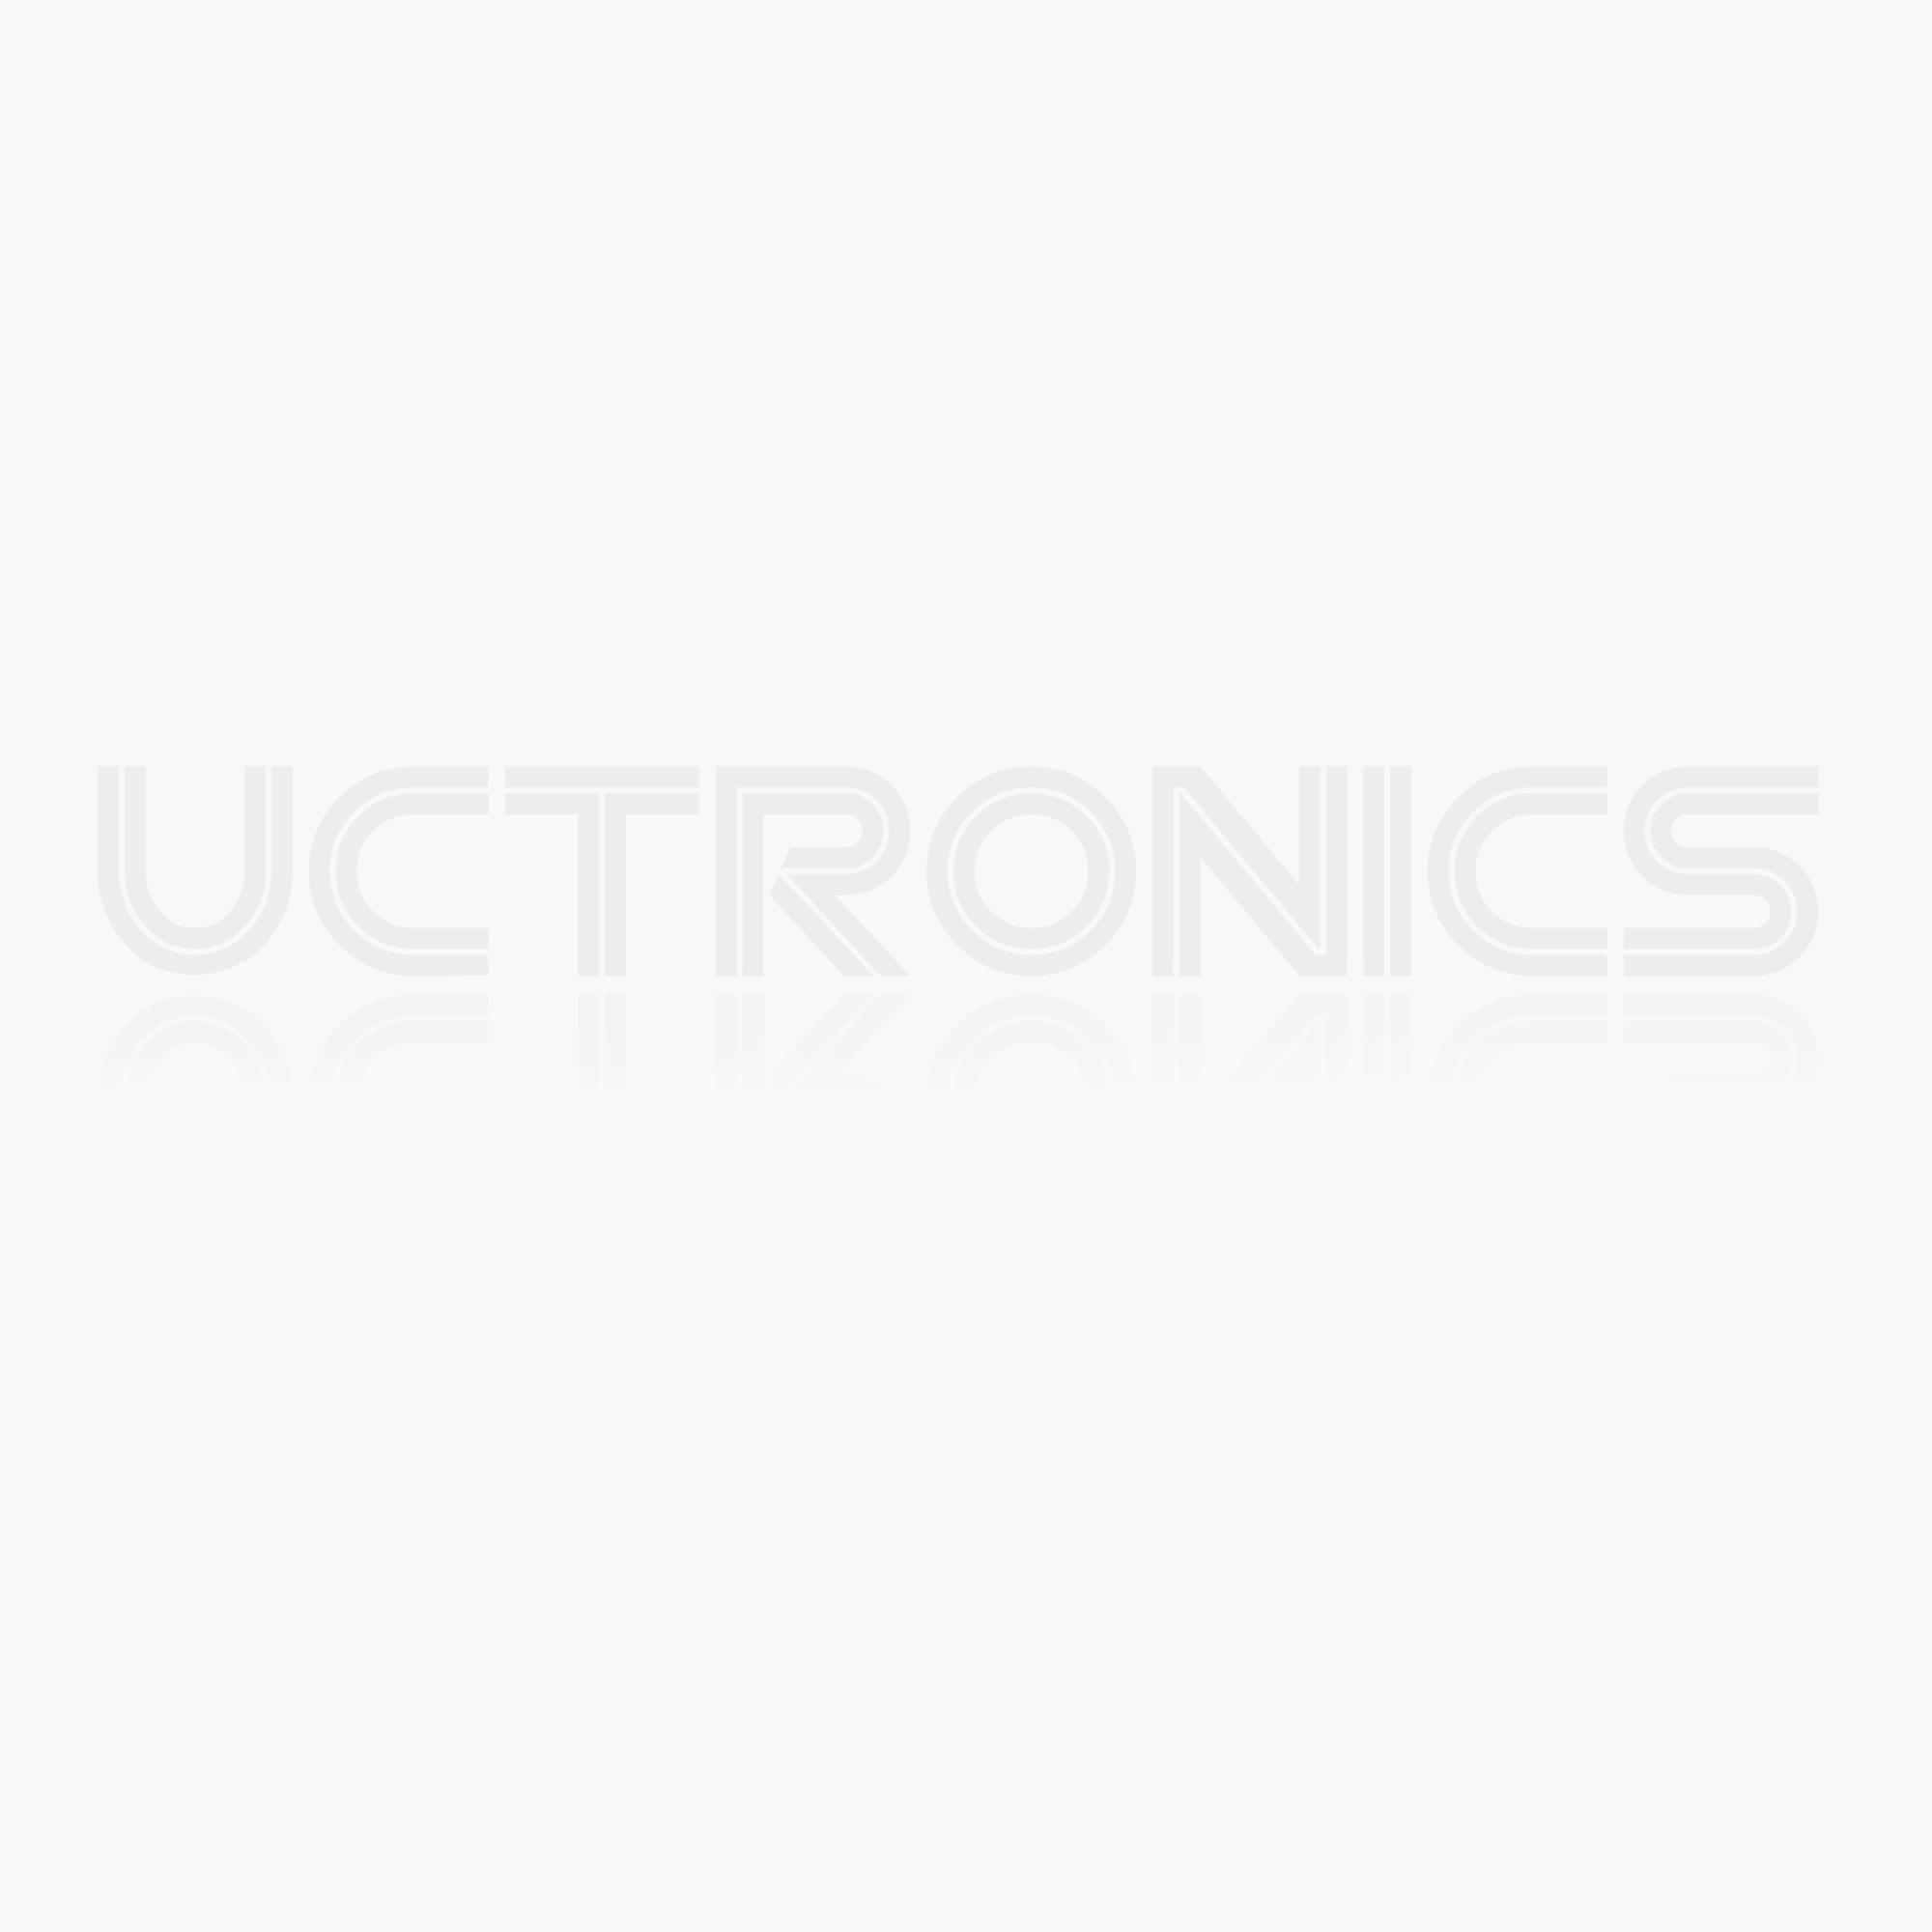 DS18B20 18B20 Digital Temperature Thermometer Sensor Module for Arduino